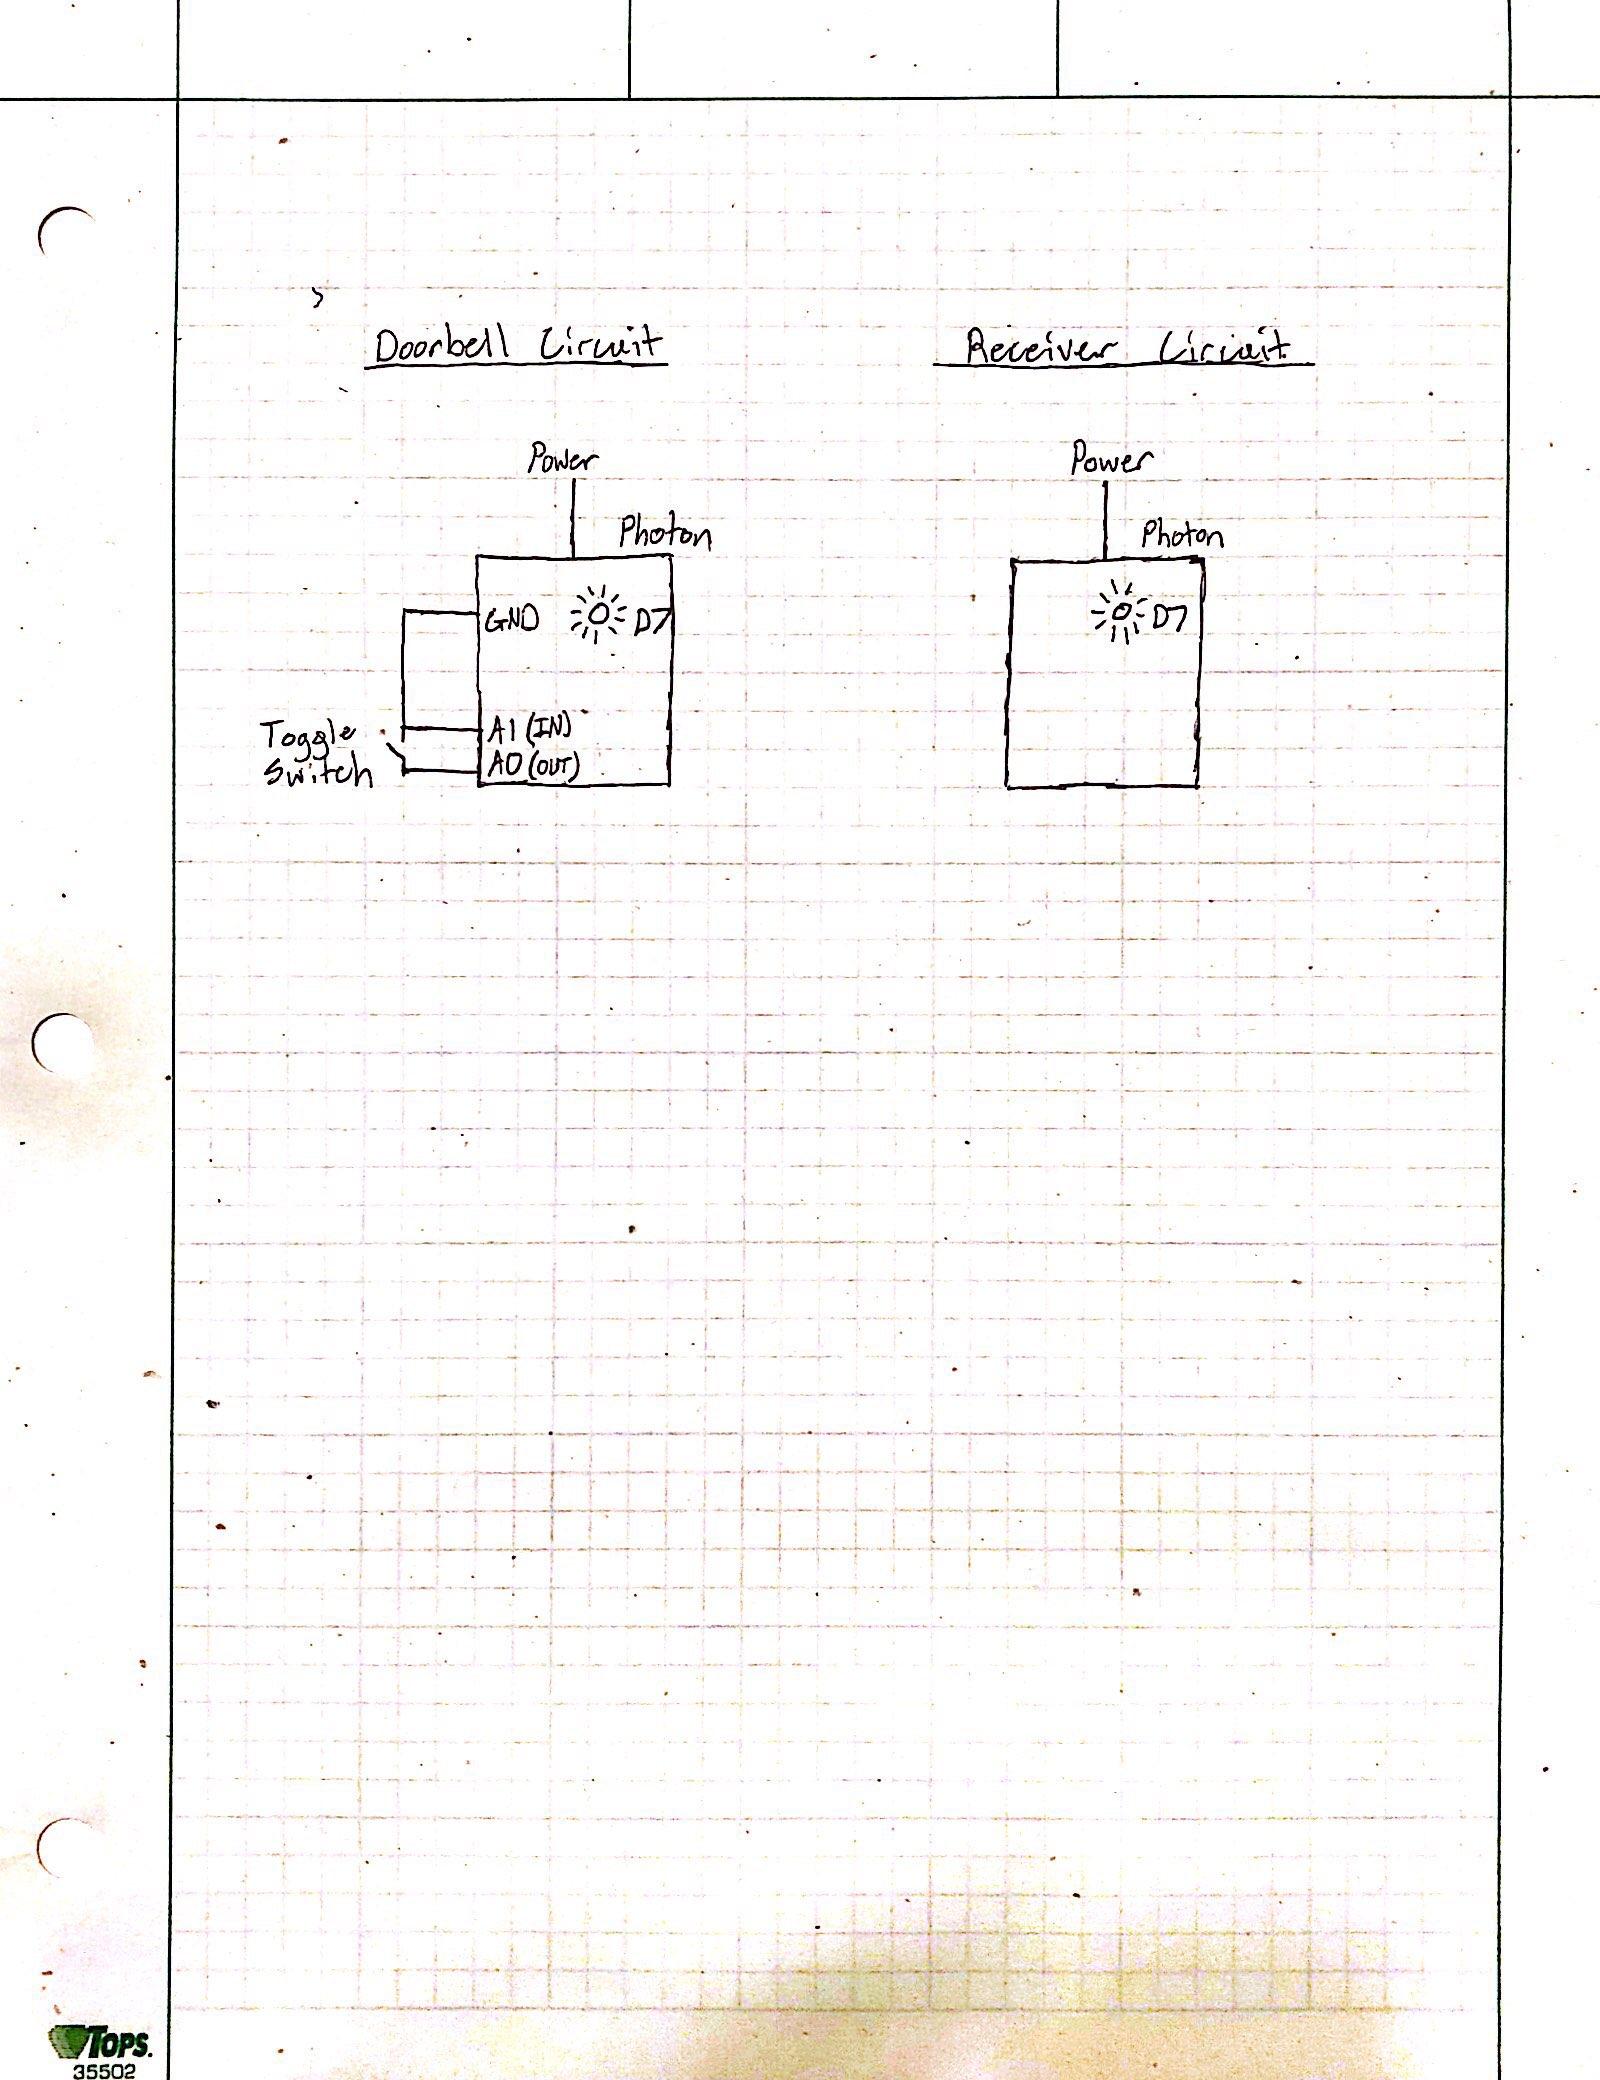 Circuits wdhvy2frk6